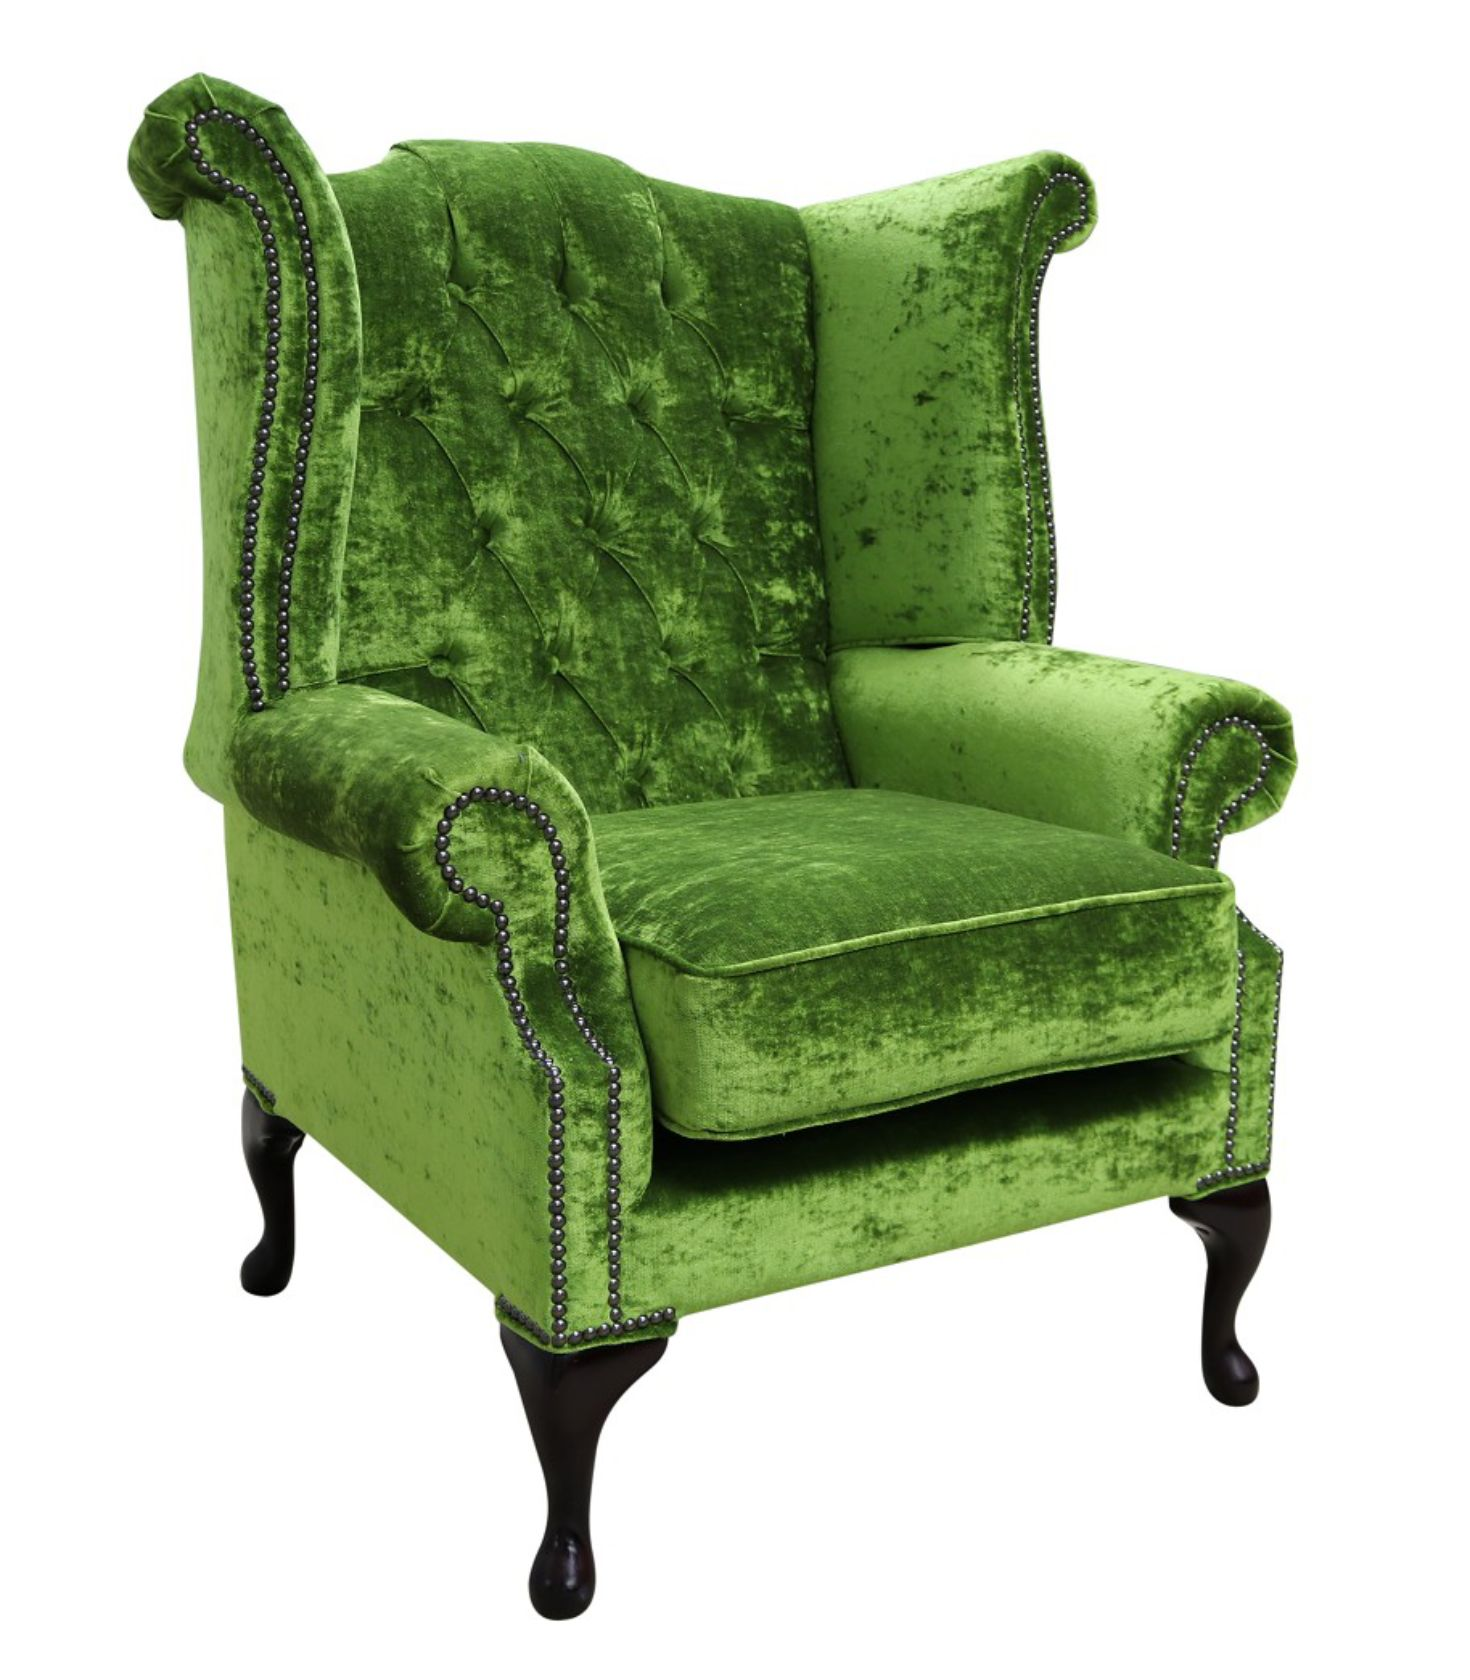 Green Chesterfield Queen Anne High Back, Green Velvet Wing Chair